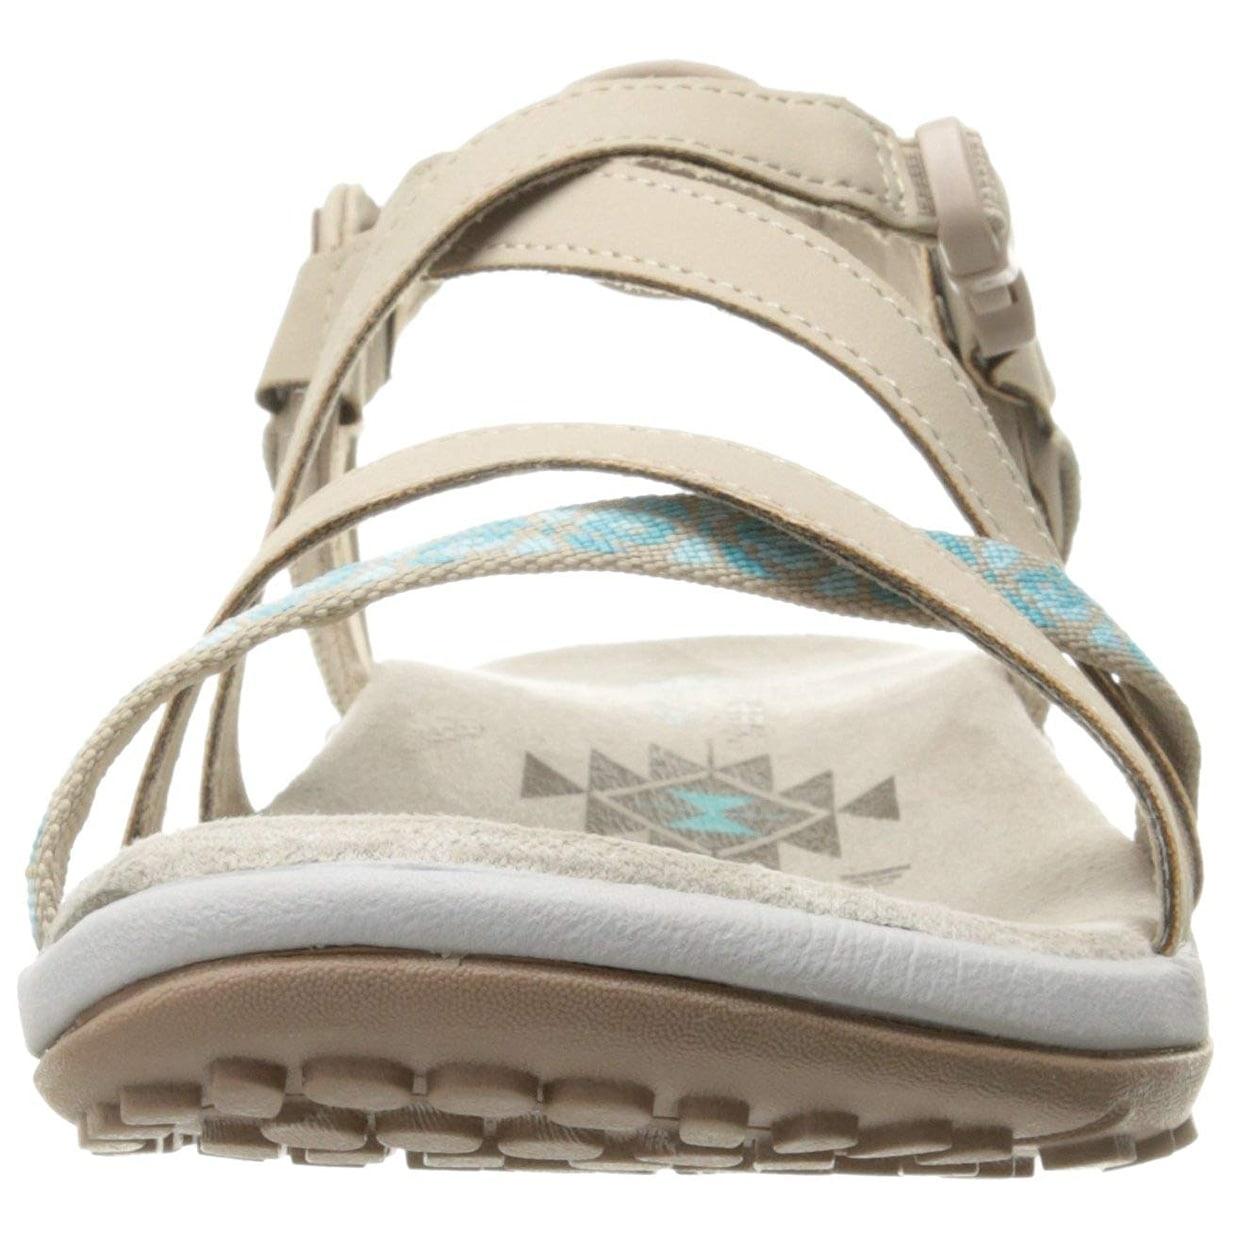 9fe8733a1e1 Shop Skechers Women s Regga Slim Keep Close Gladiator Sandal